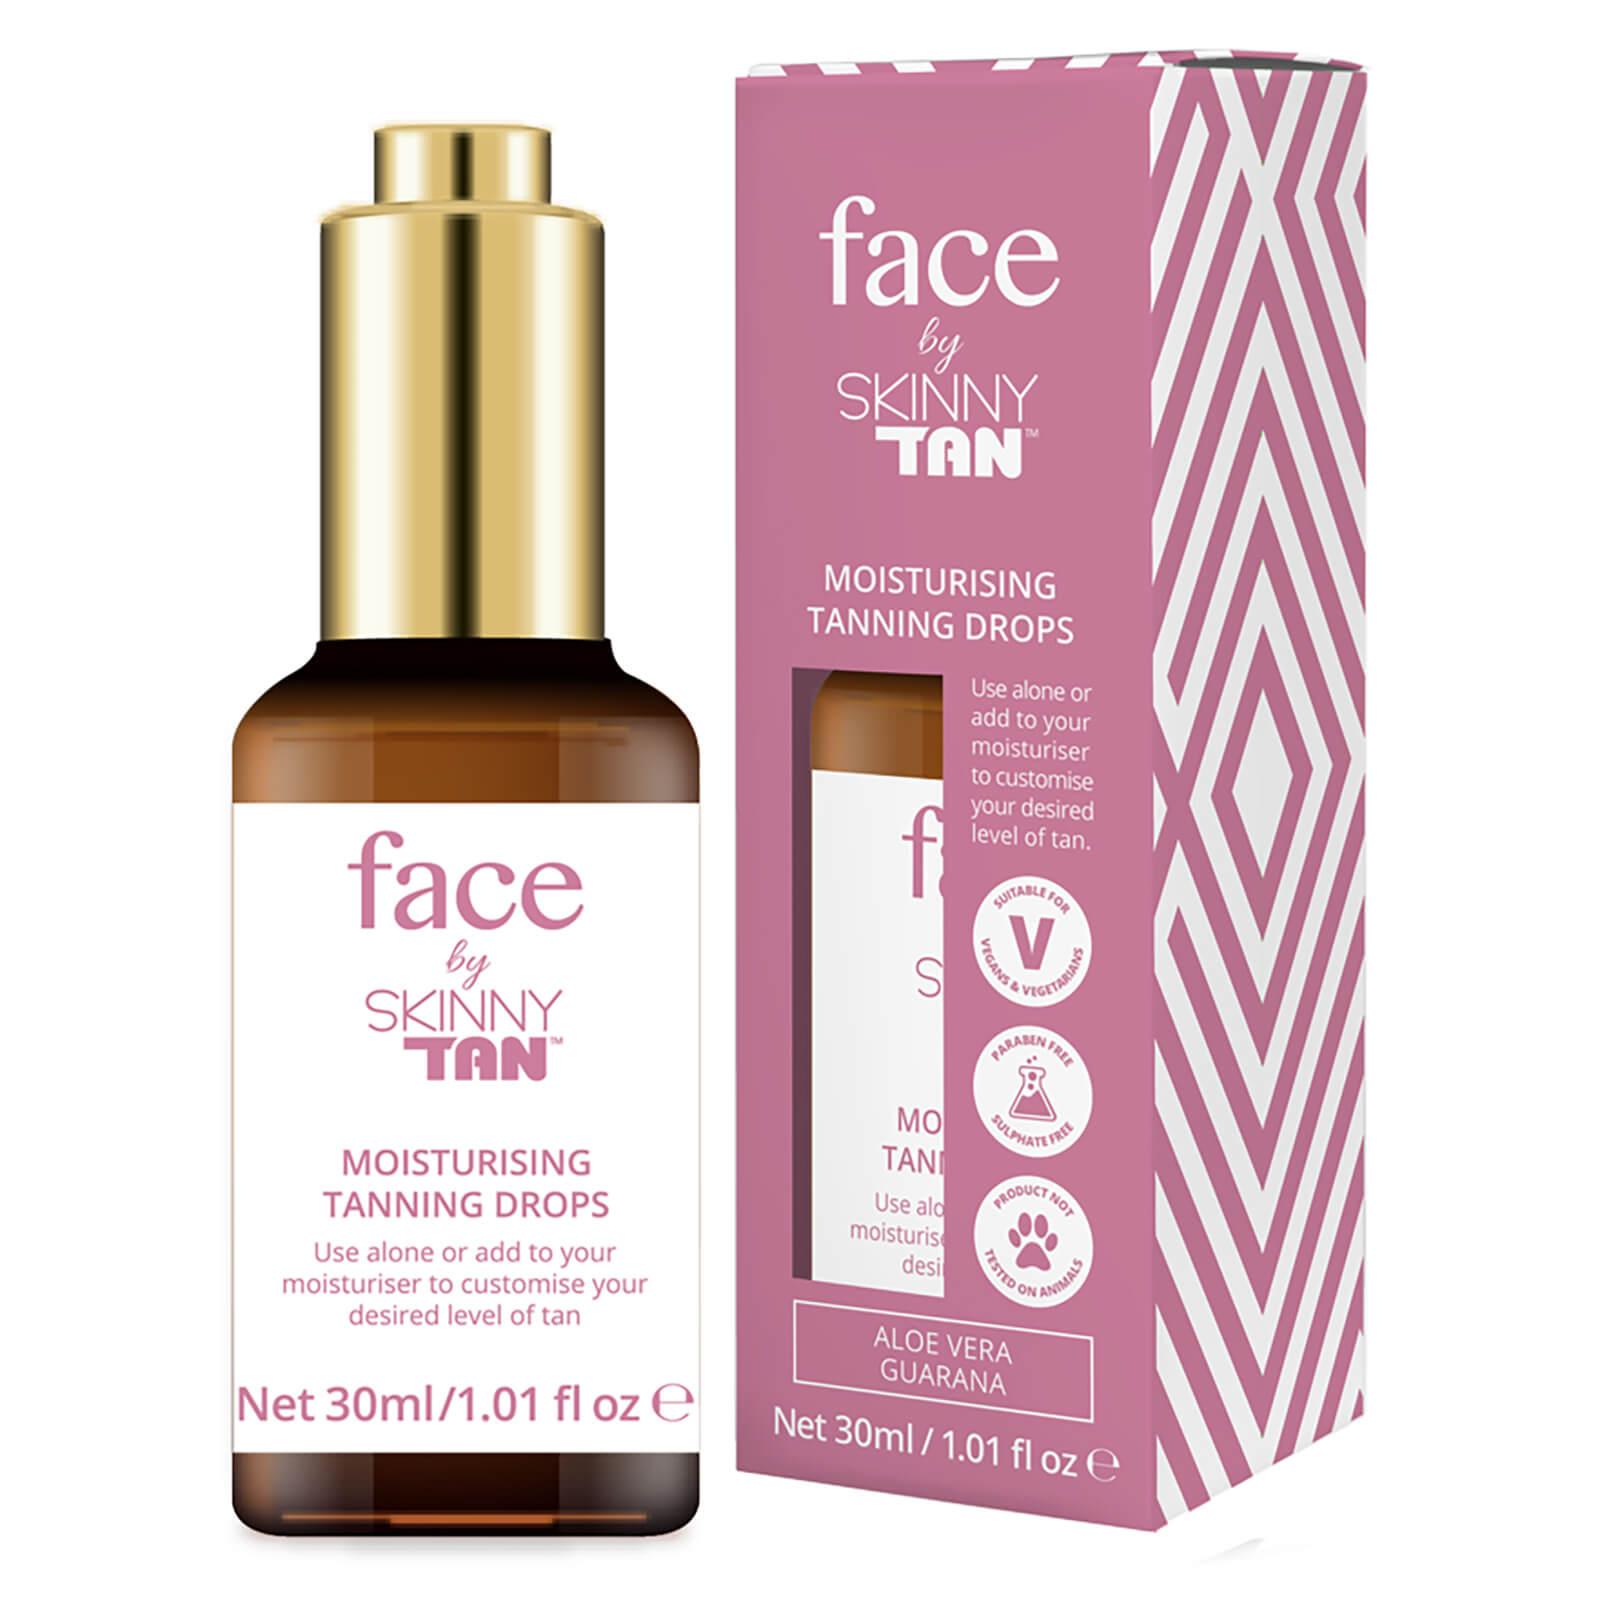 Skinny Tan Face by Skinny Tan Moisturising Oil Drops 30ml